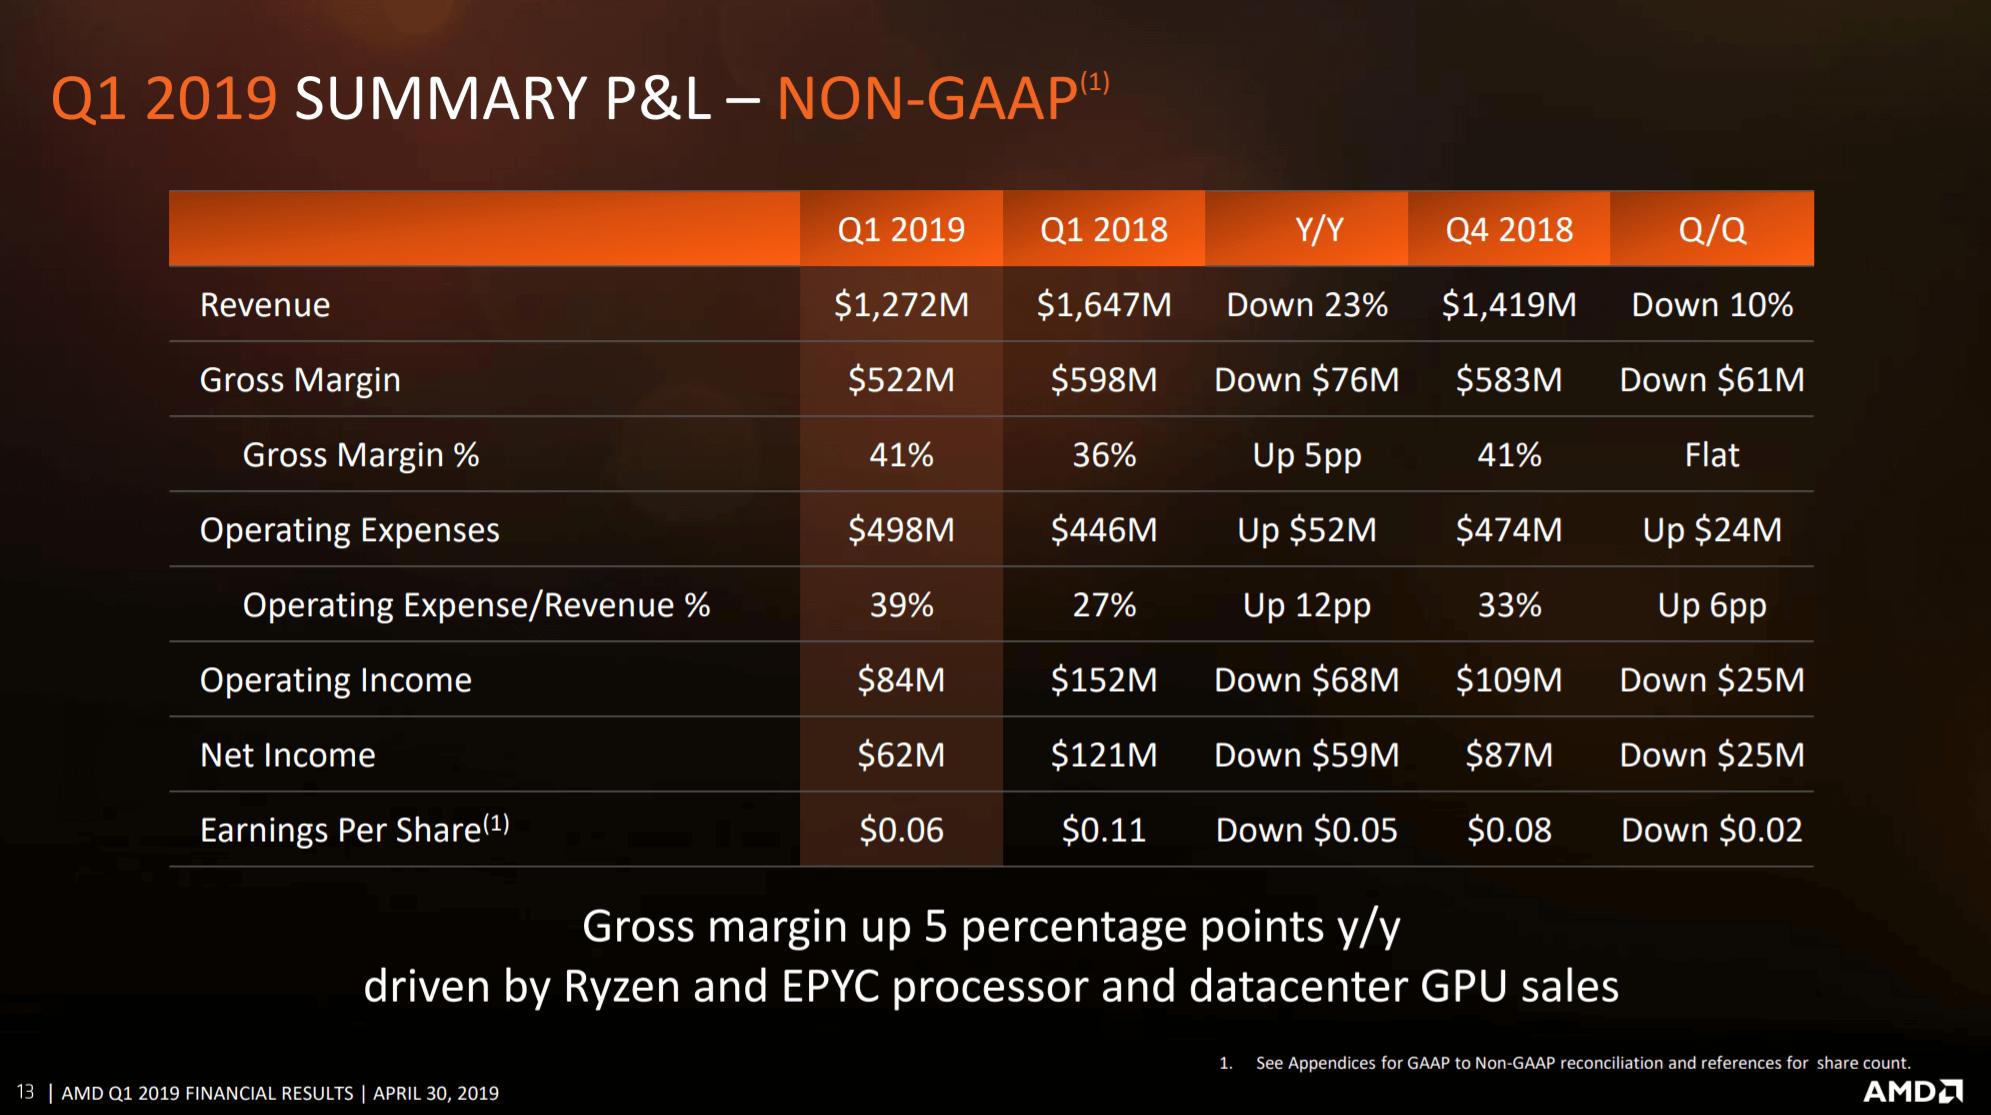 AMD reveals 7nm Navi GPU and Epyc Rome CPUs will launch next quarter